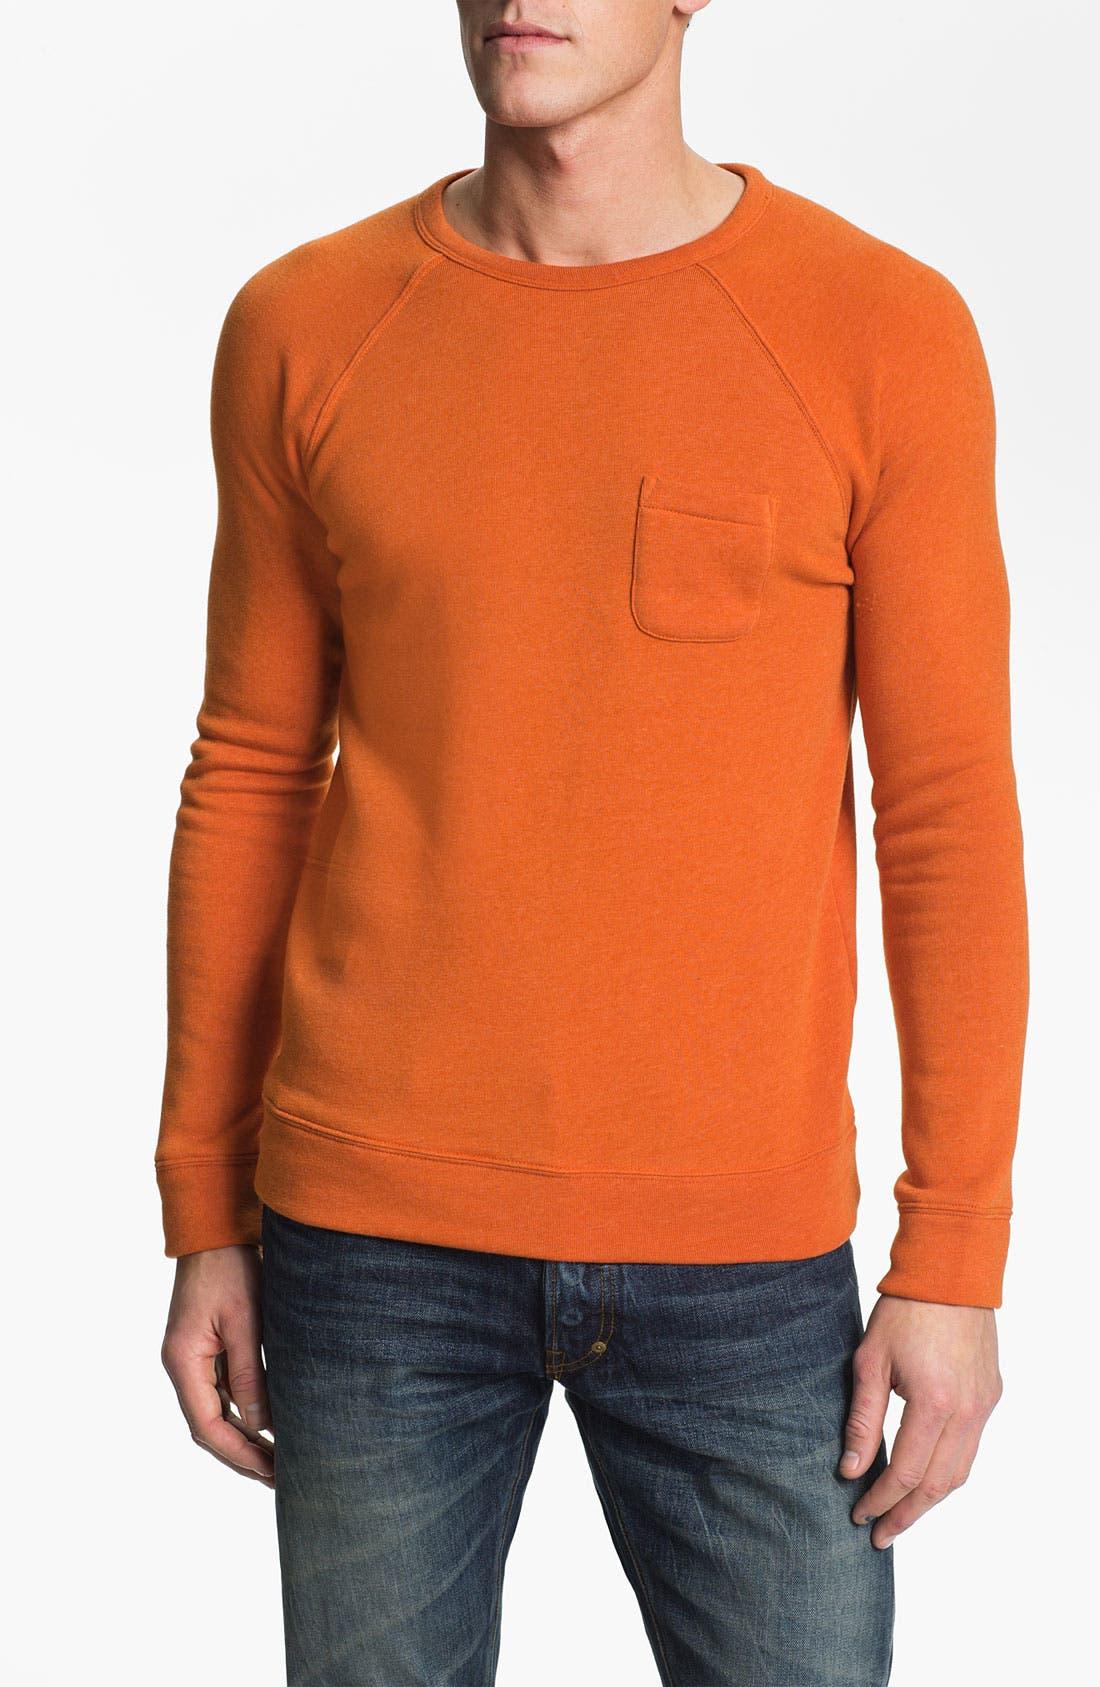 Lofty Creature Comforts Crewneck Sweatshirt,                         Main,                         color, Apricot